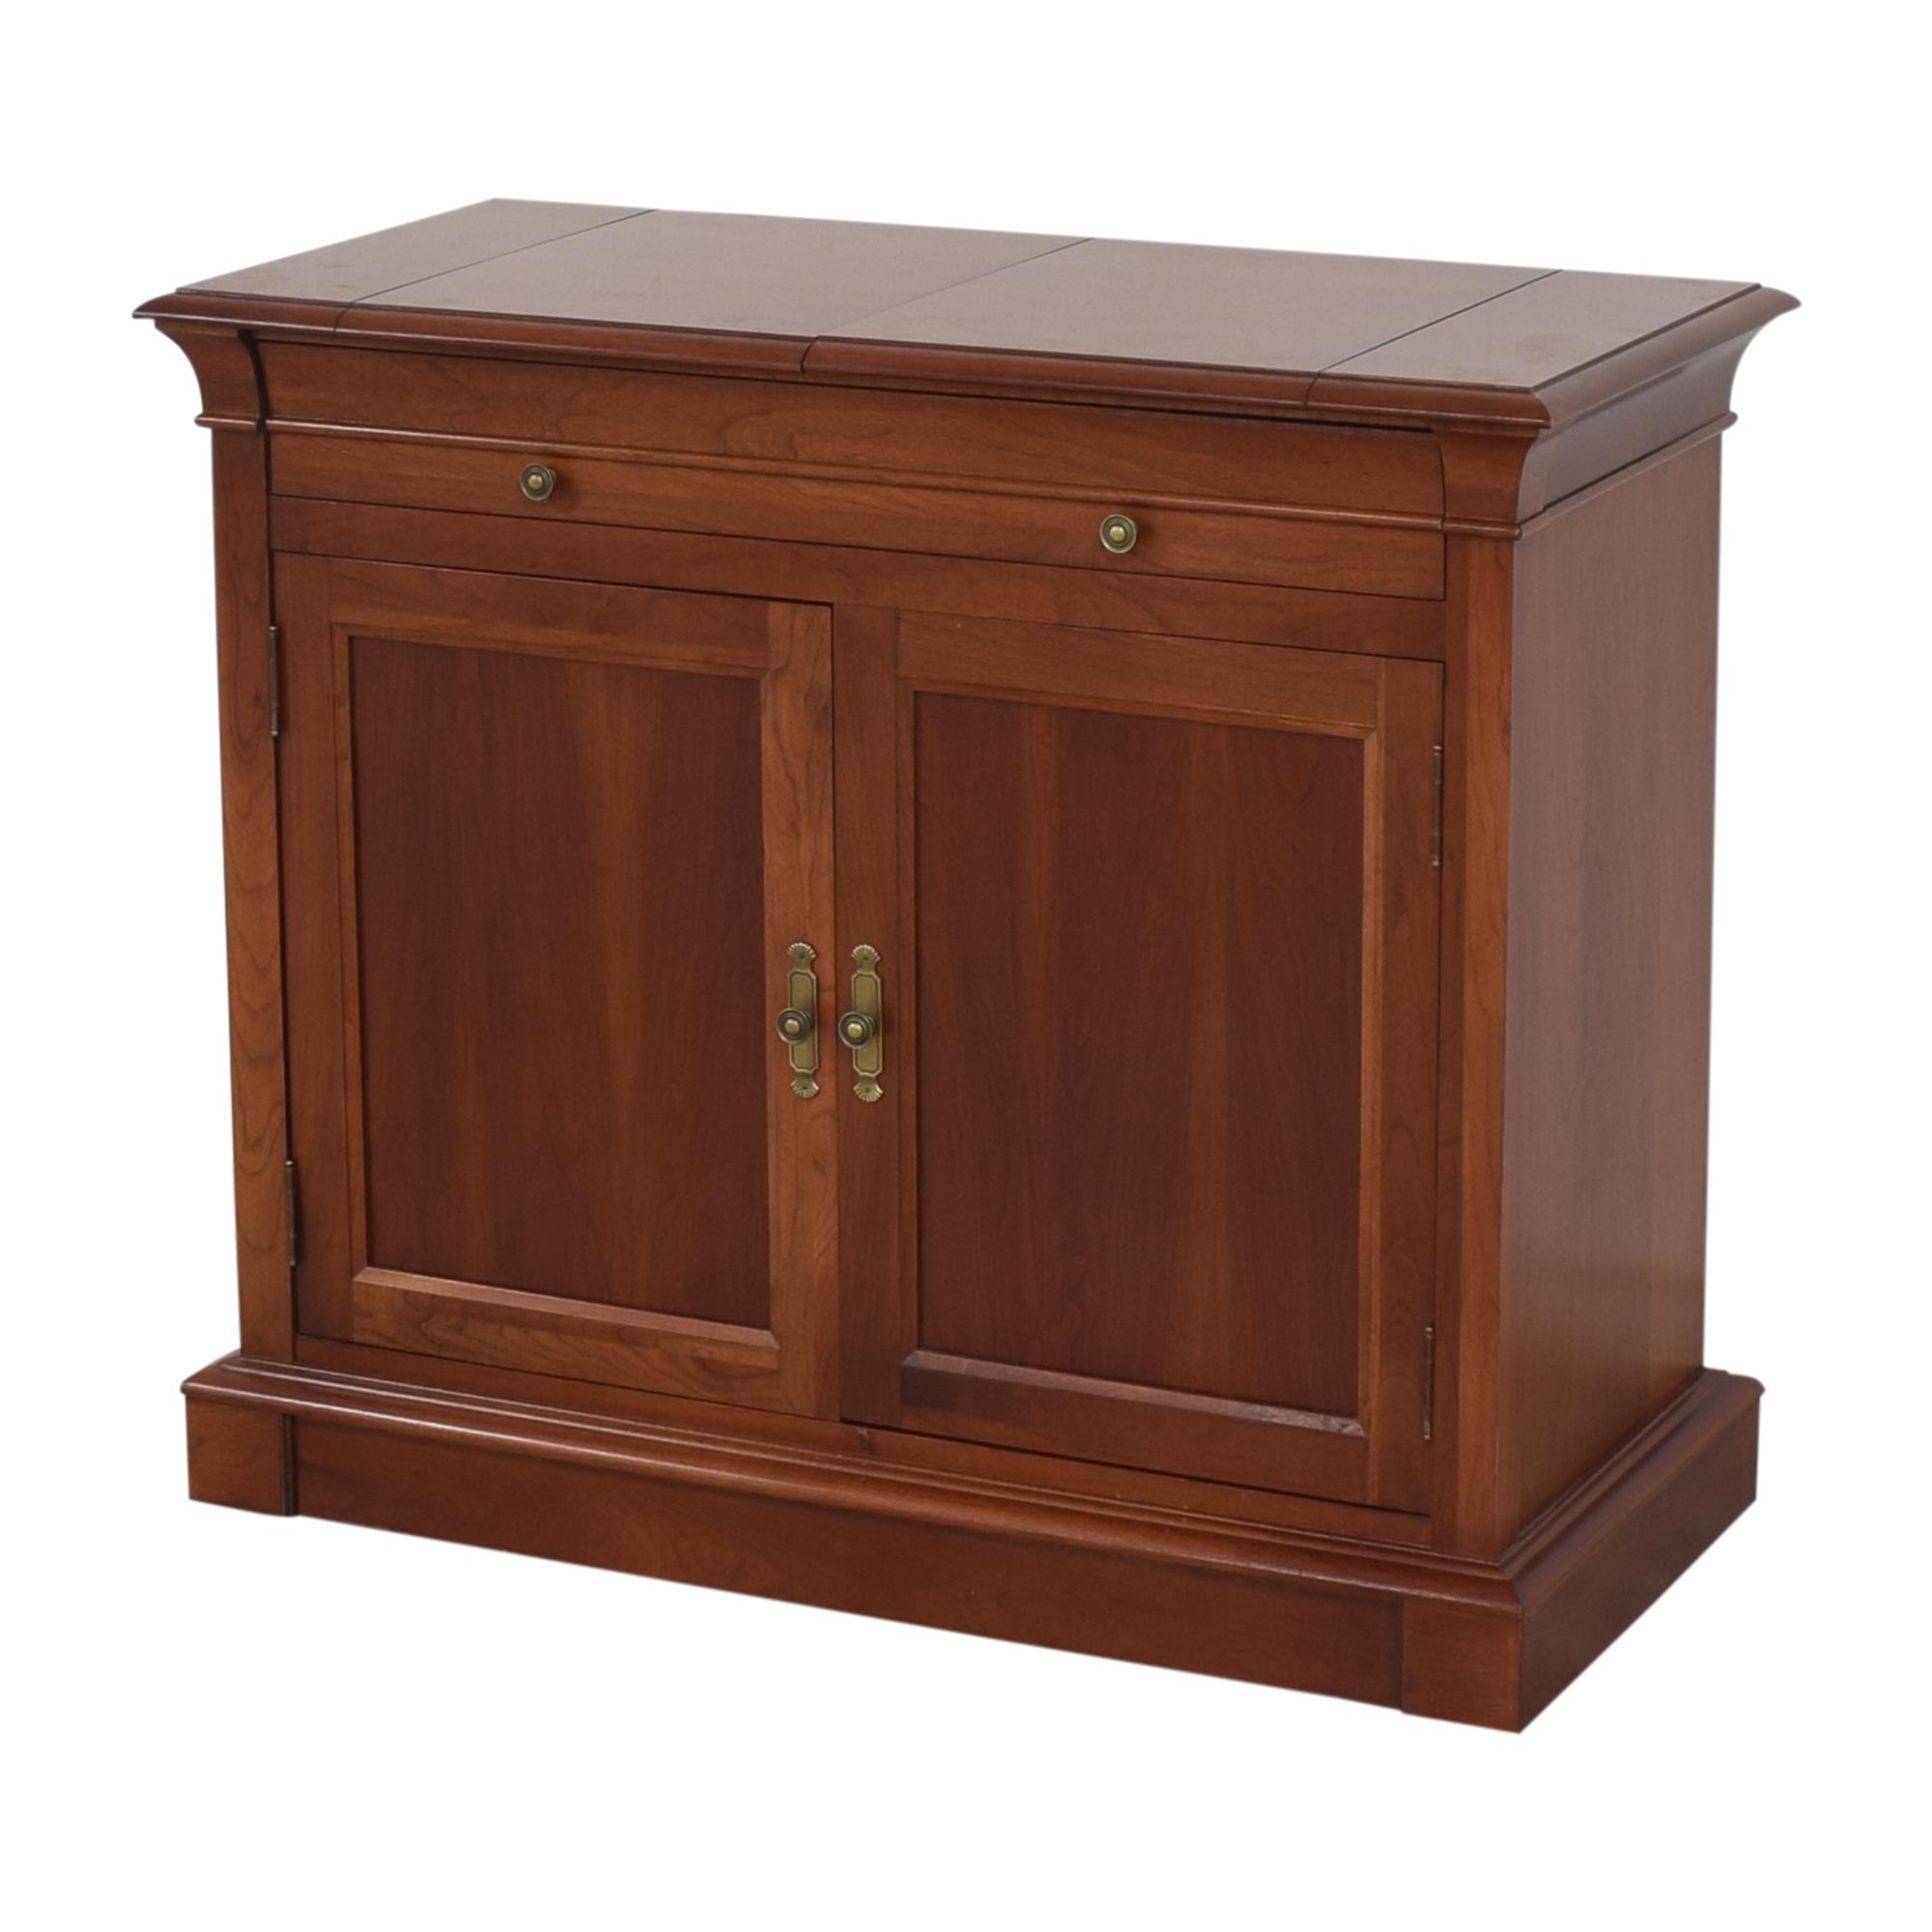 Ethan Allen Ethan Allen Medallion Flip Top Buffet Cabinet on sale